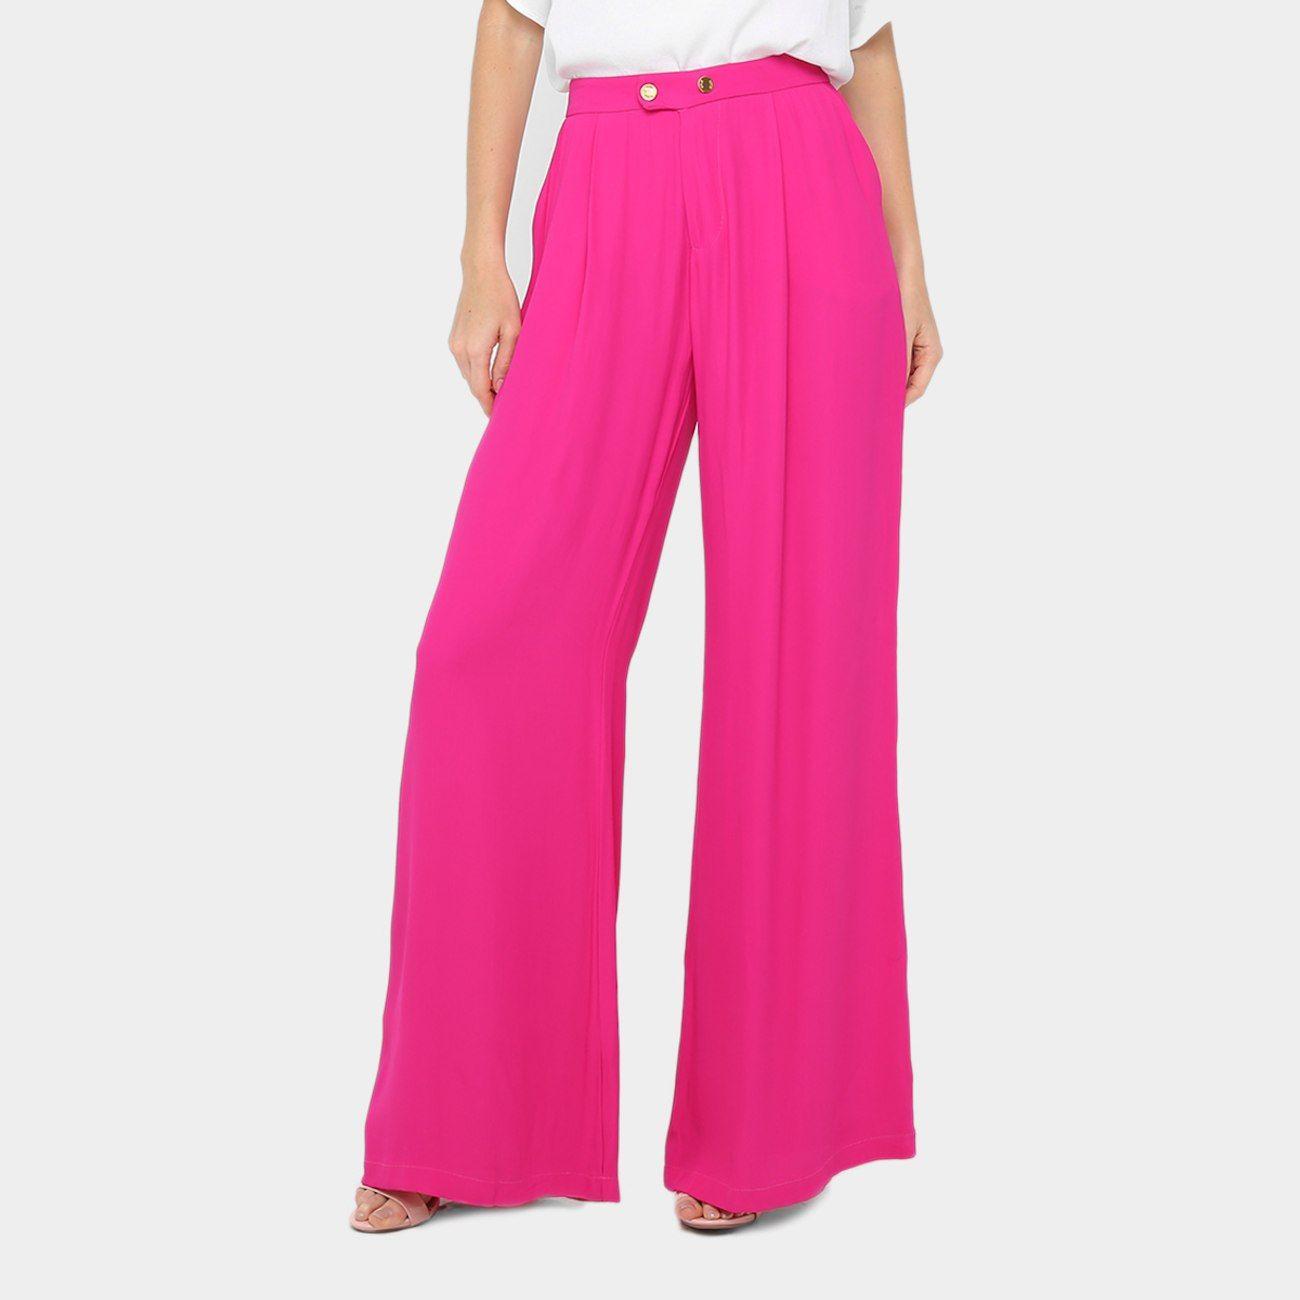 eb0f4db0d Calça Pantalona Forum Alfaiataria Cintura Alta Feminina - Rosa [CLIQUE EM  VISITAR]